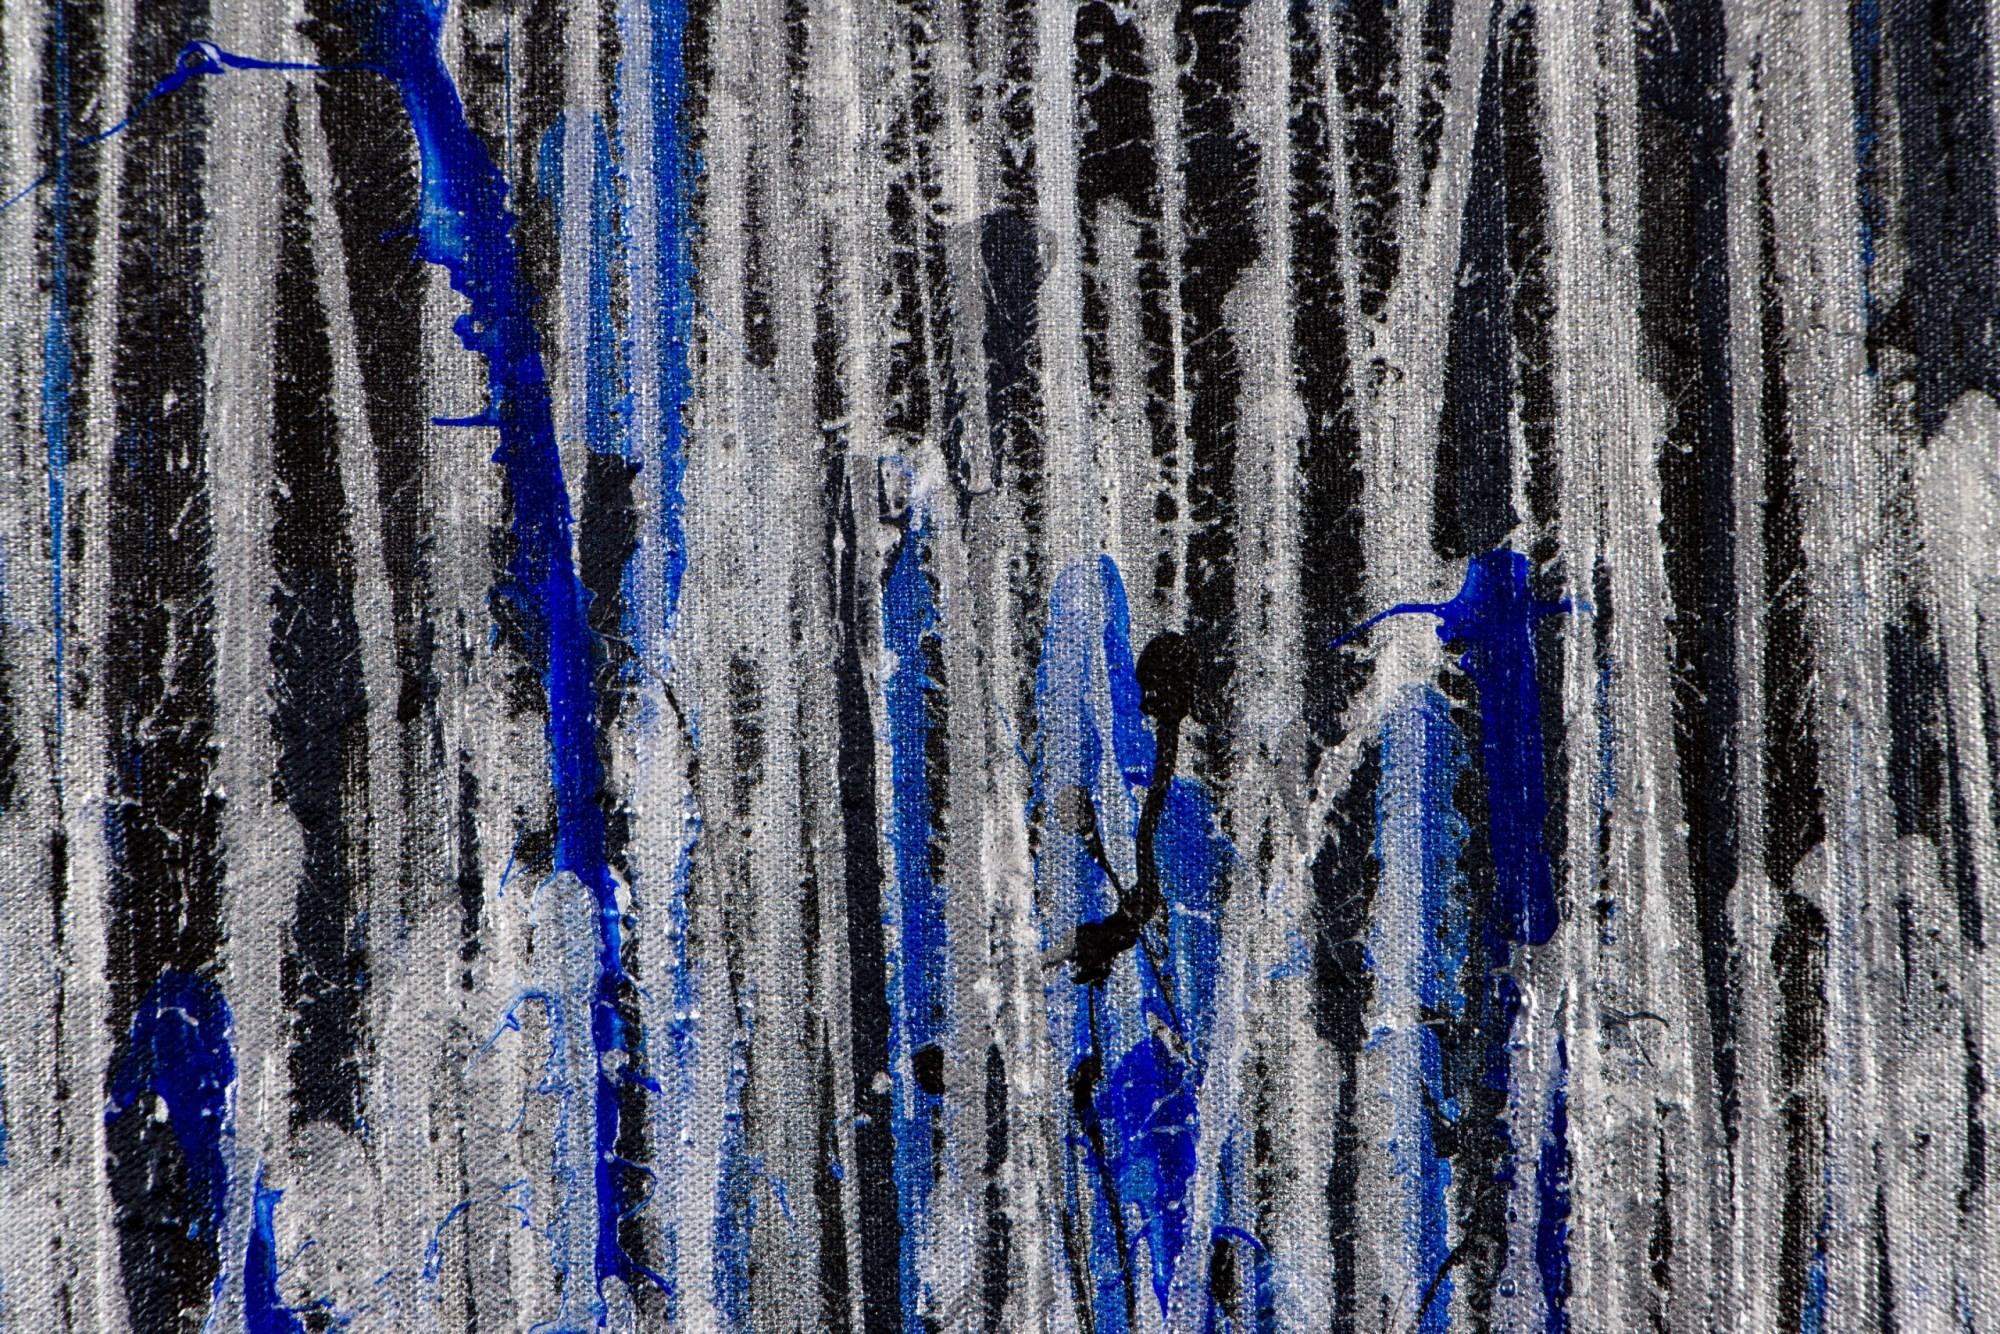 Nighttime Fearlessness 3 (2020) by Nestor Toro